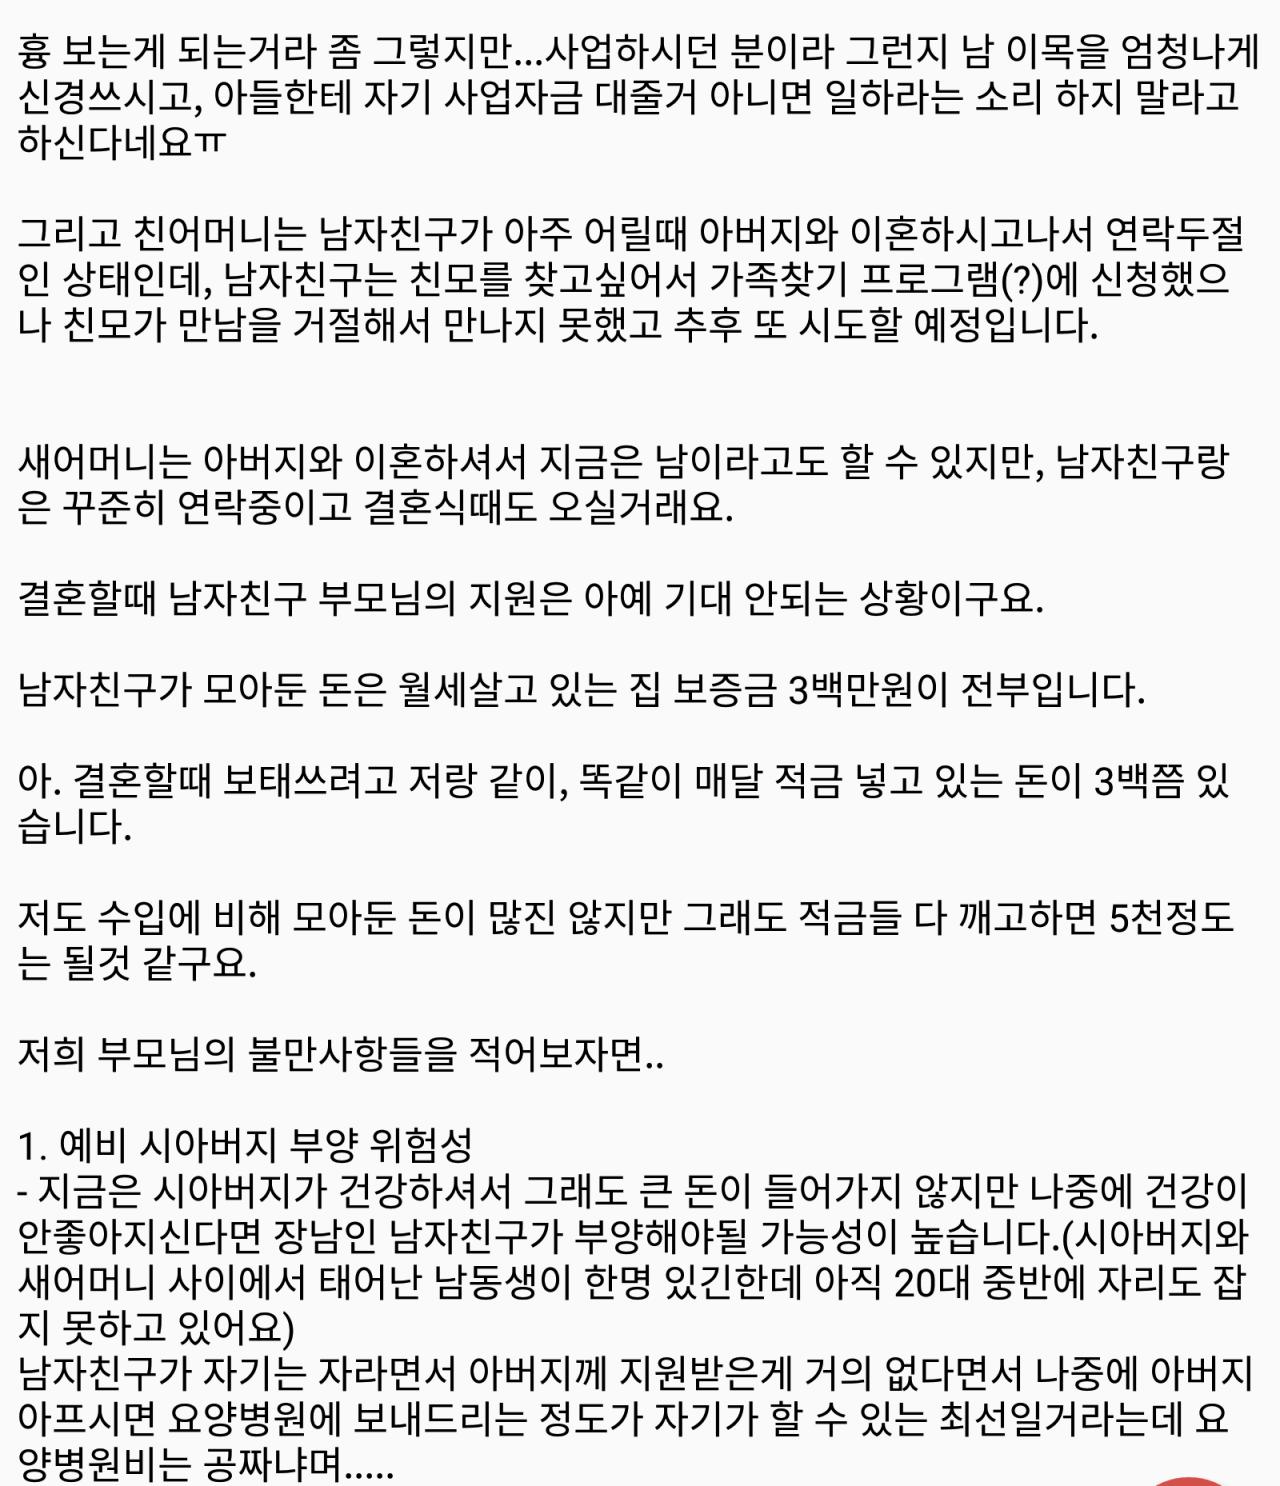 IMG_20180515_133422.png 현재 엠팍에서 댓글 500개 넘긴 예비신부 사연.jpg